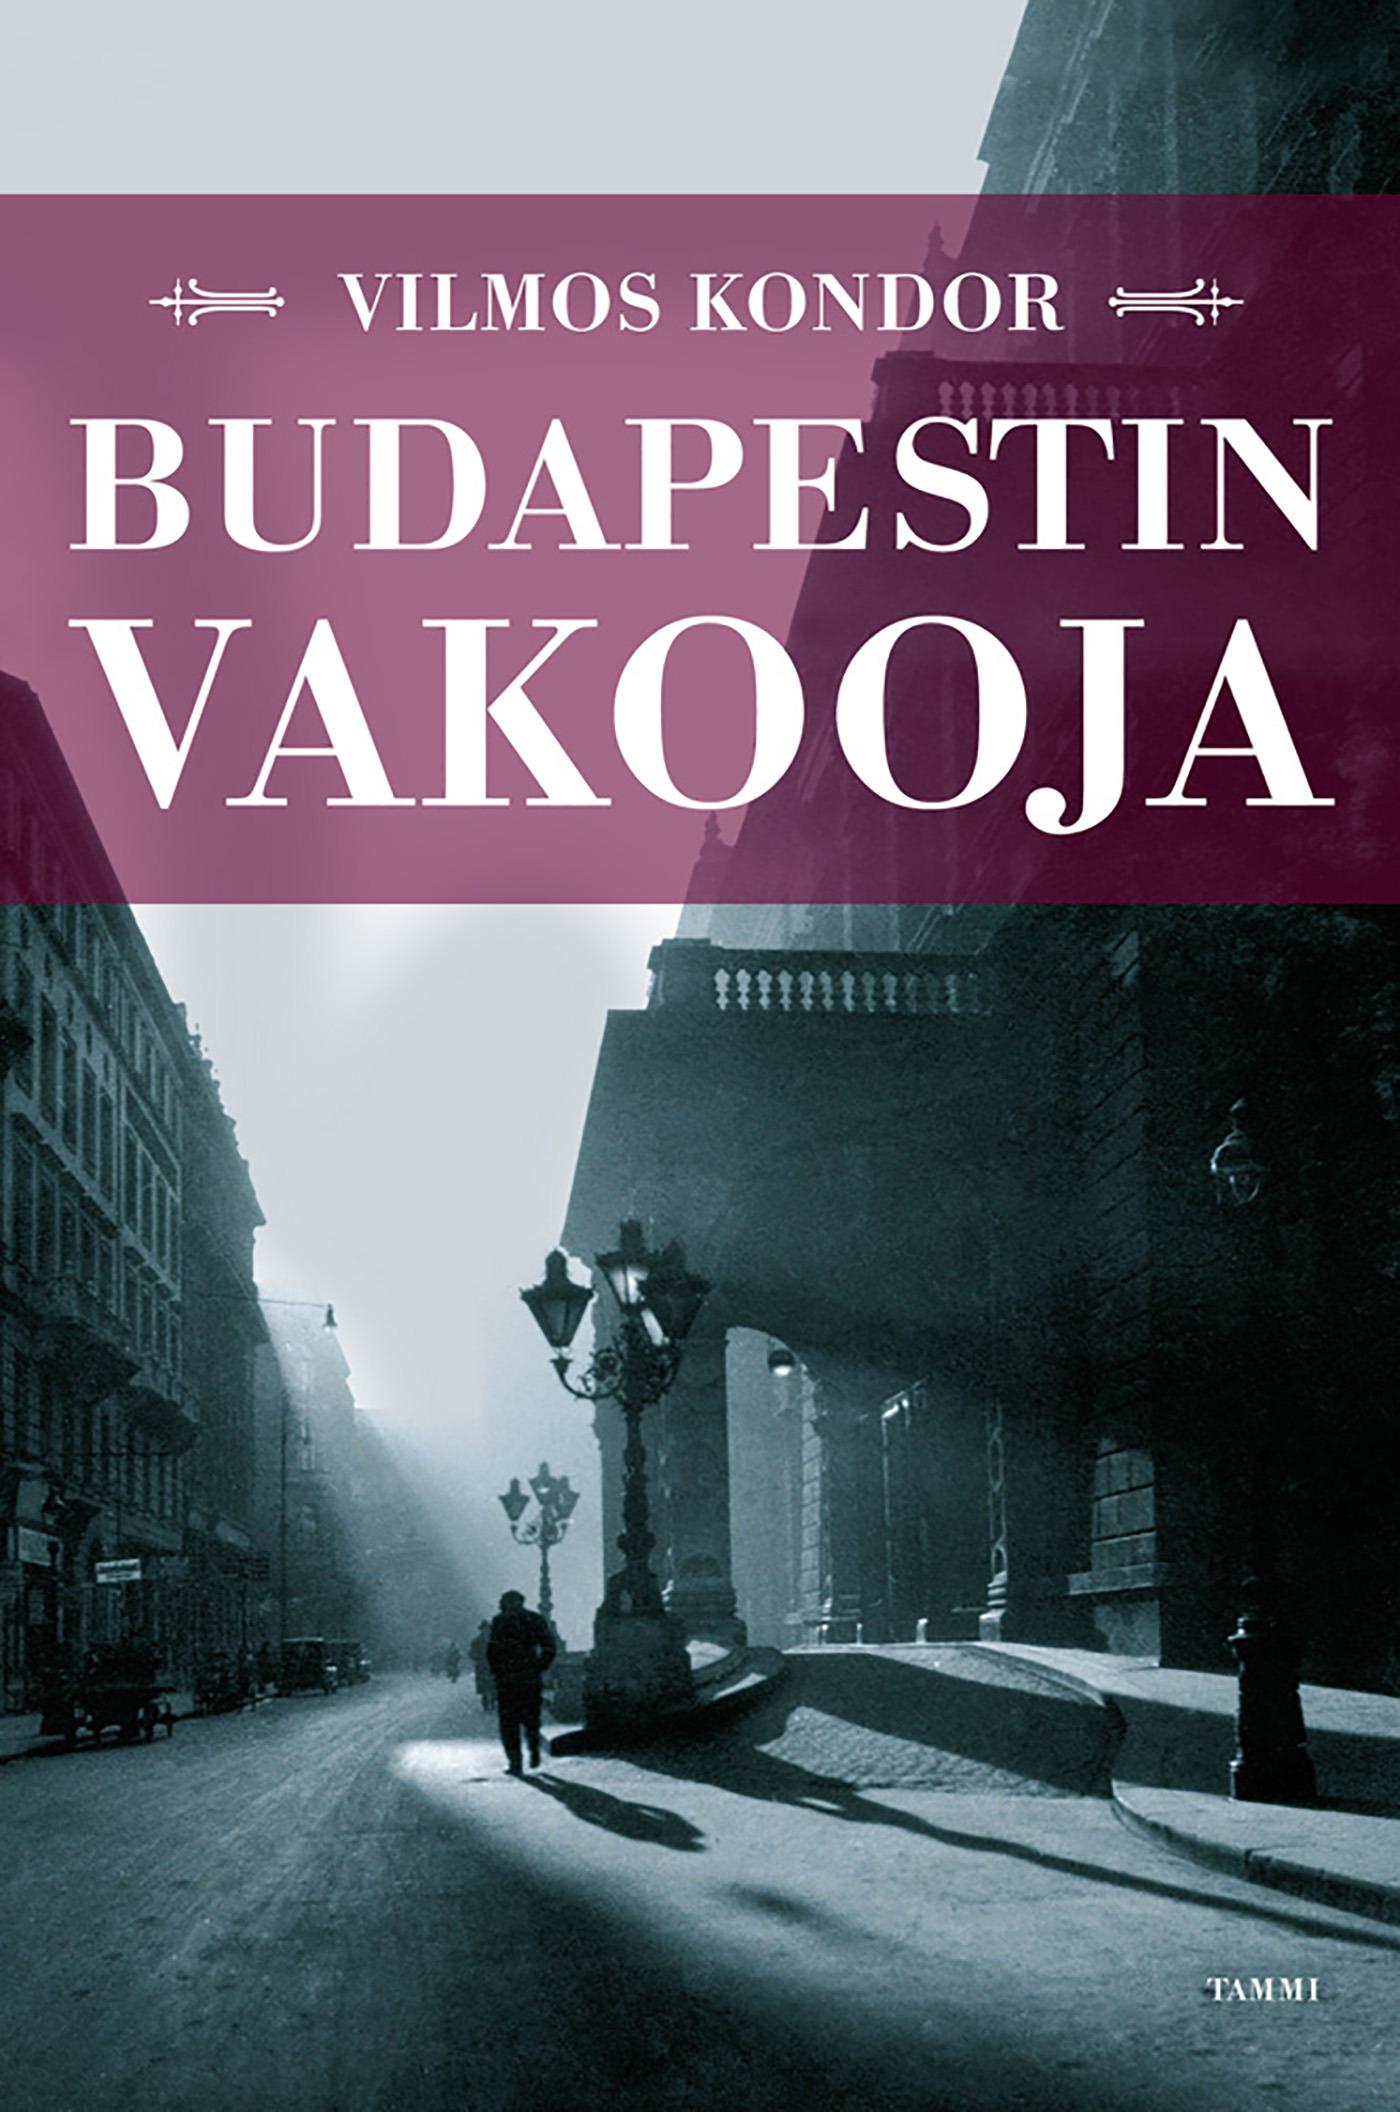 Kondor, Vilmos - Budapestin vakooja, e-kirja